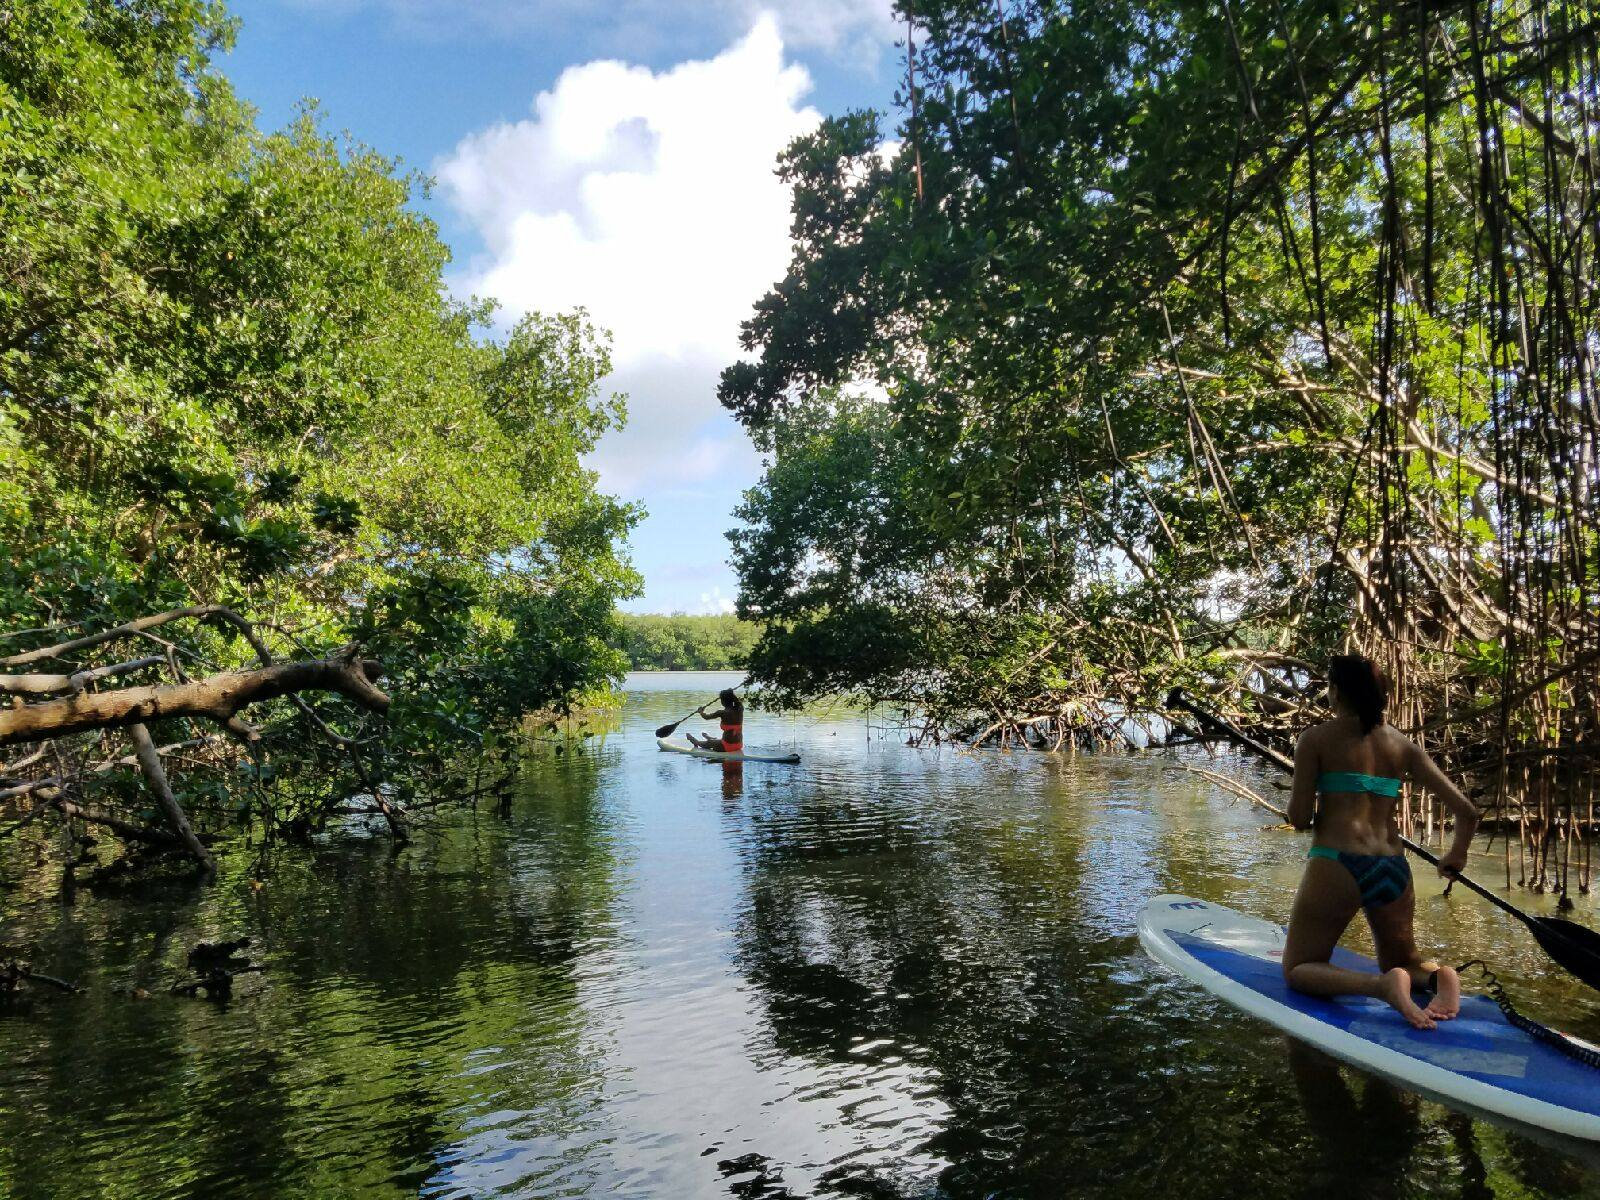 Paddleboard Adventure